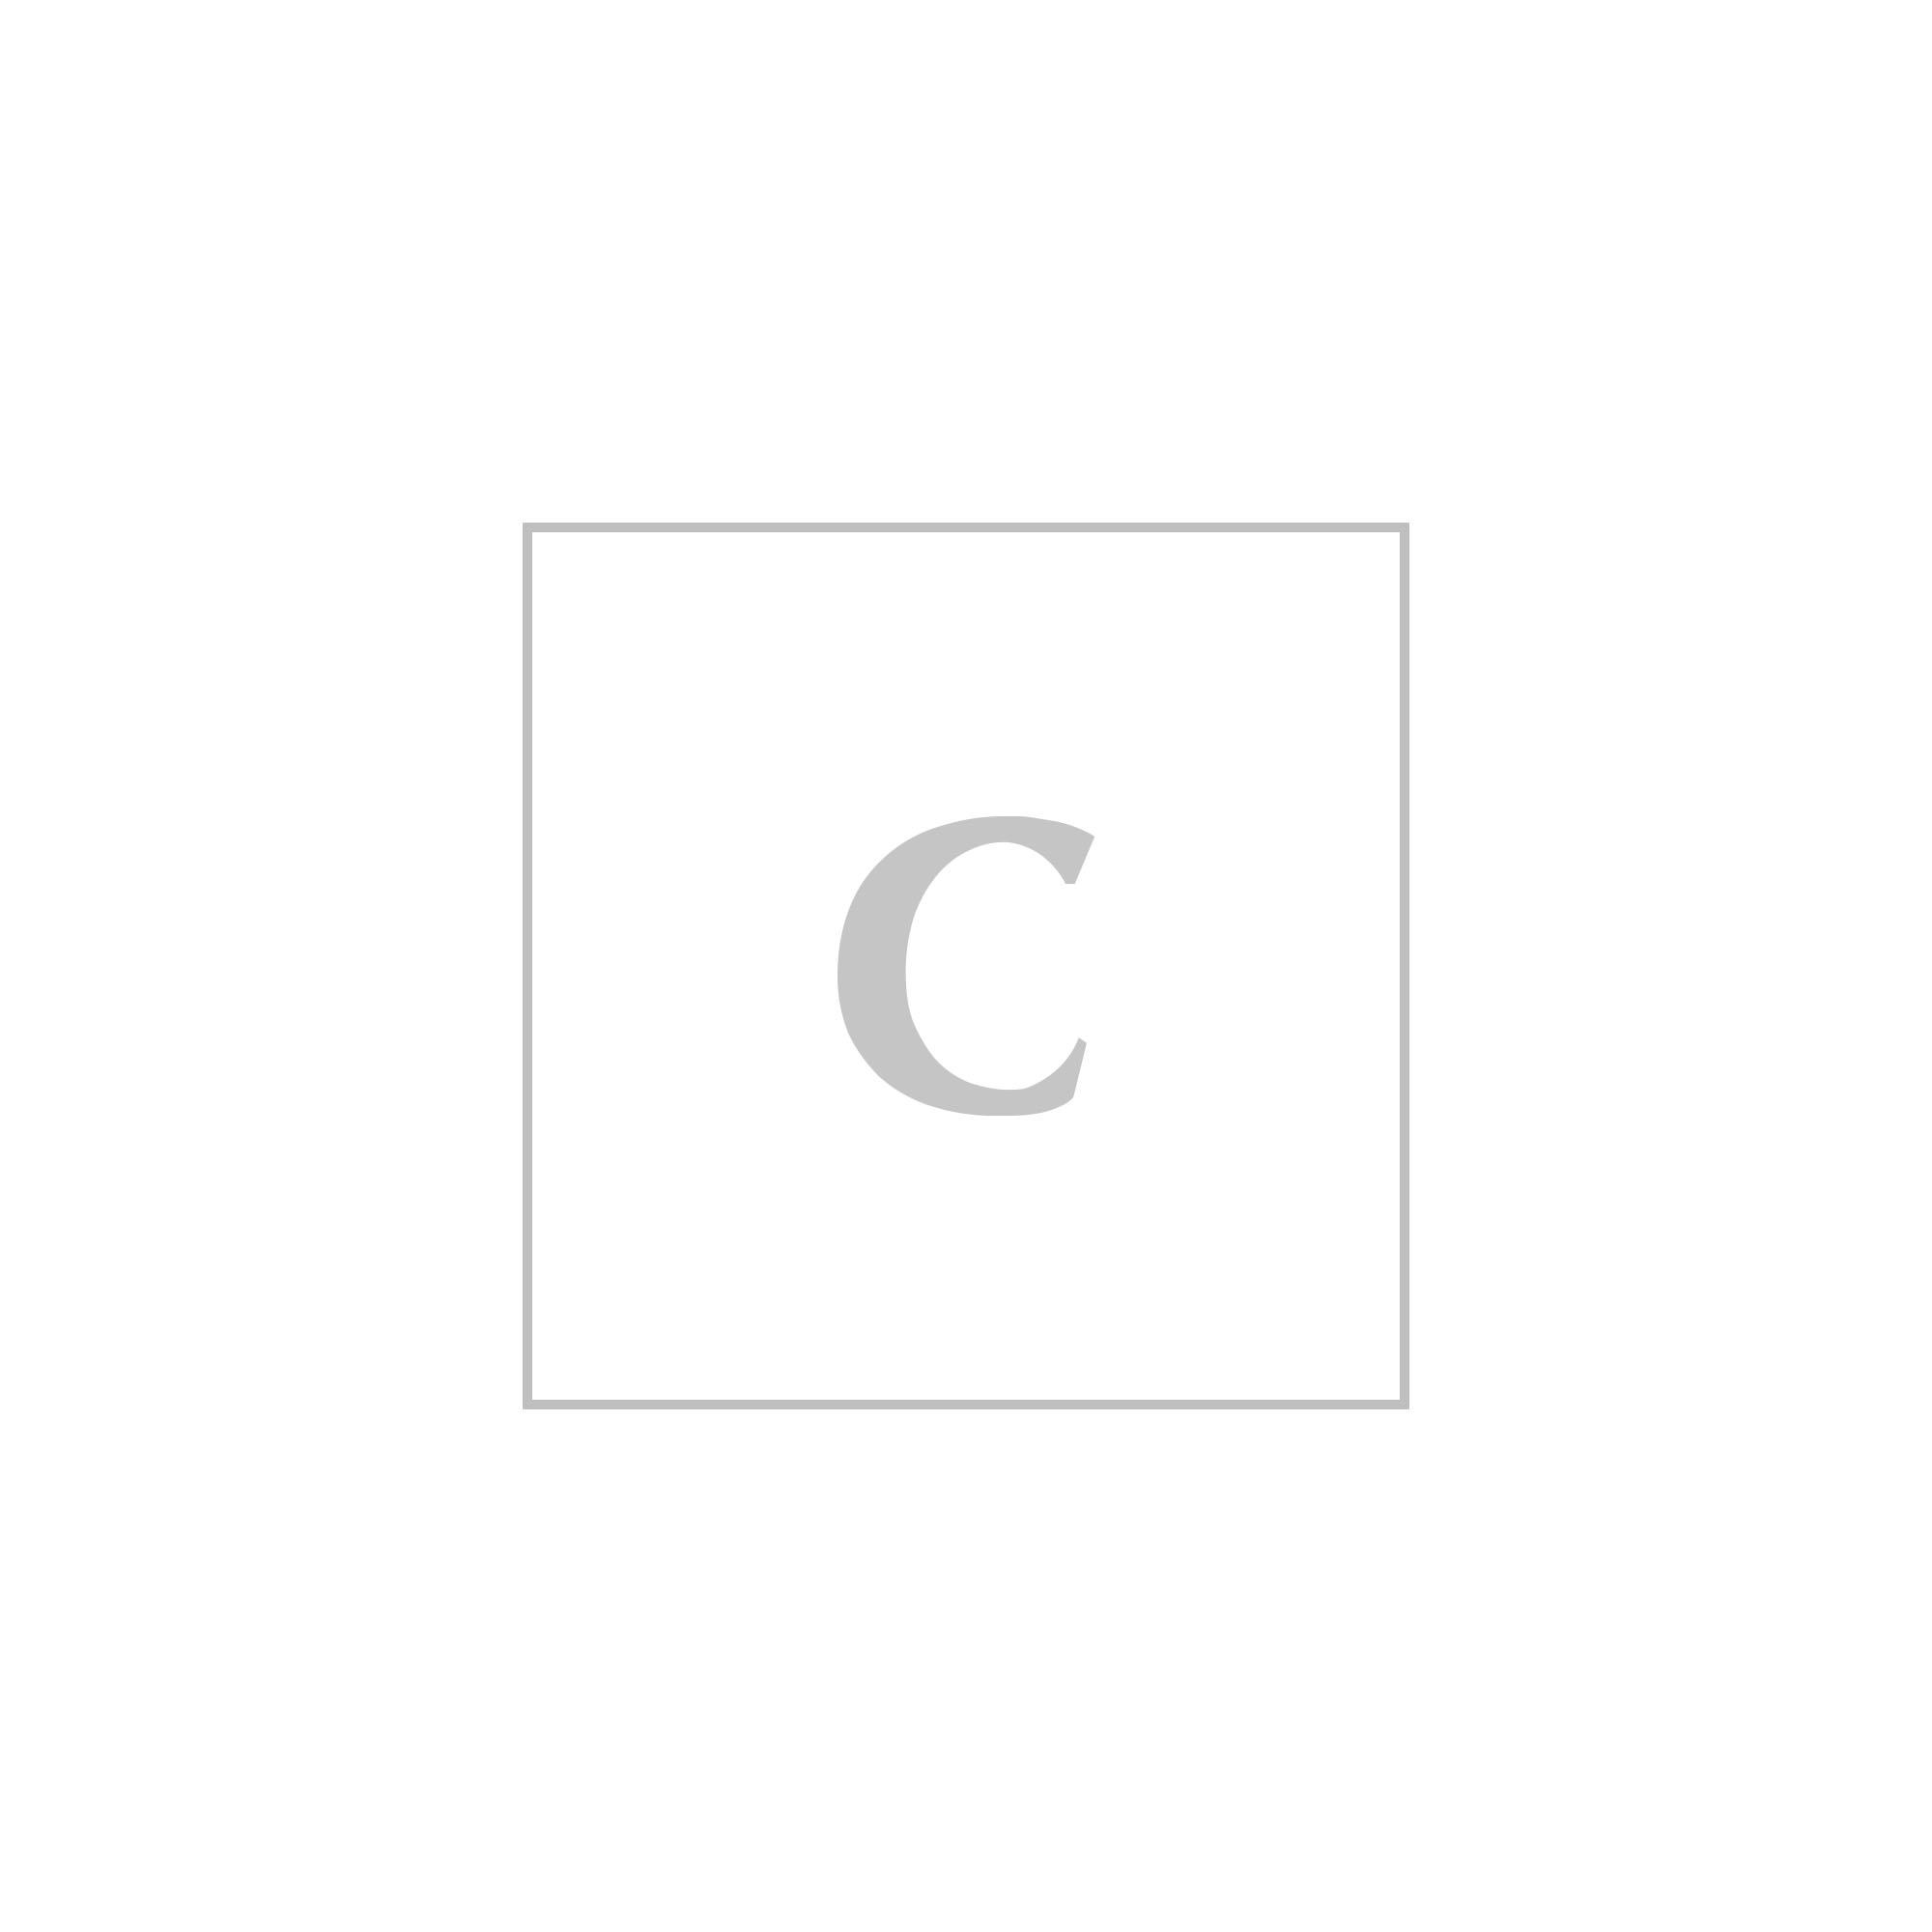 Saint laurent ysl monogram grain clutch